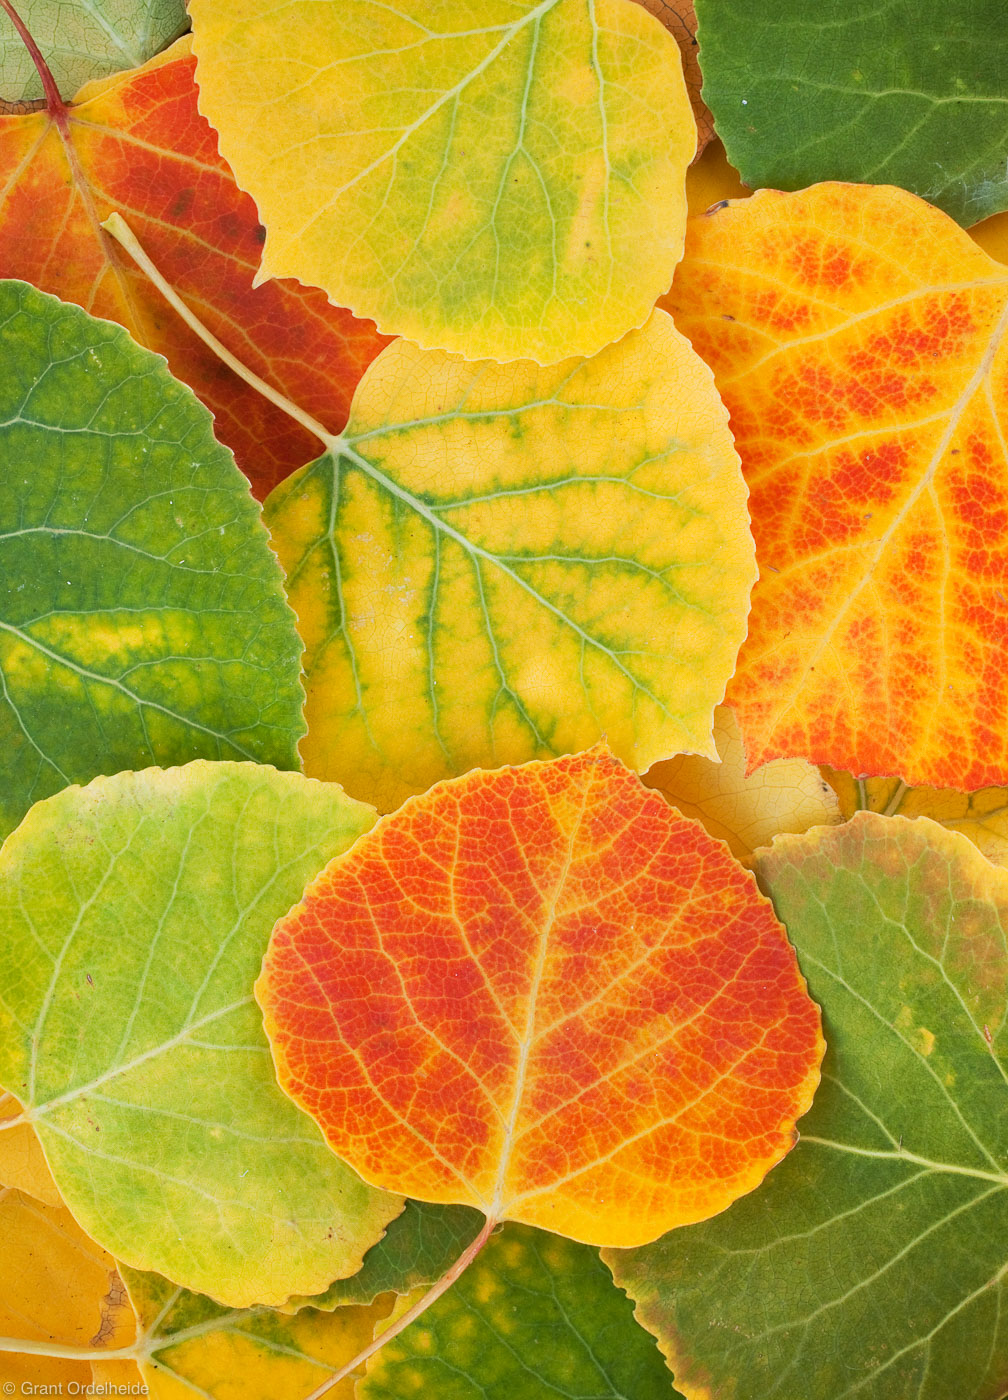 aspen, leaves, leaf, detail, telluride, colorado, photo